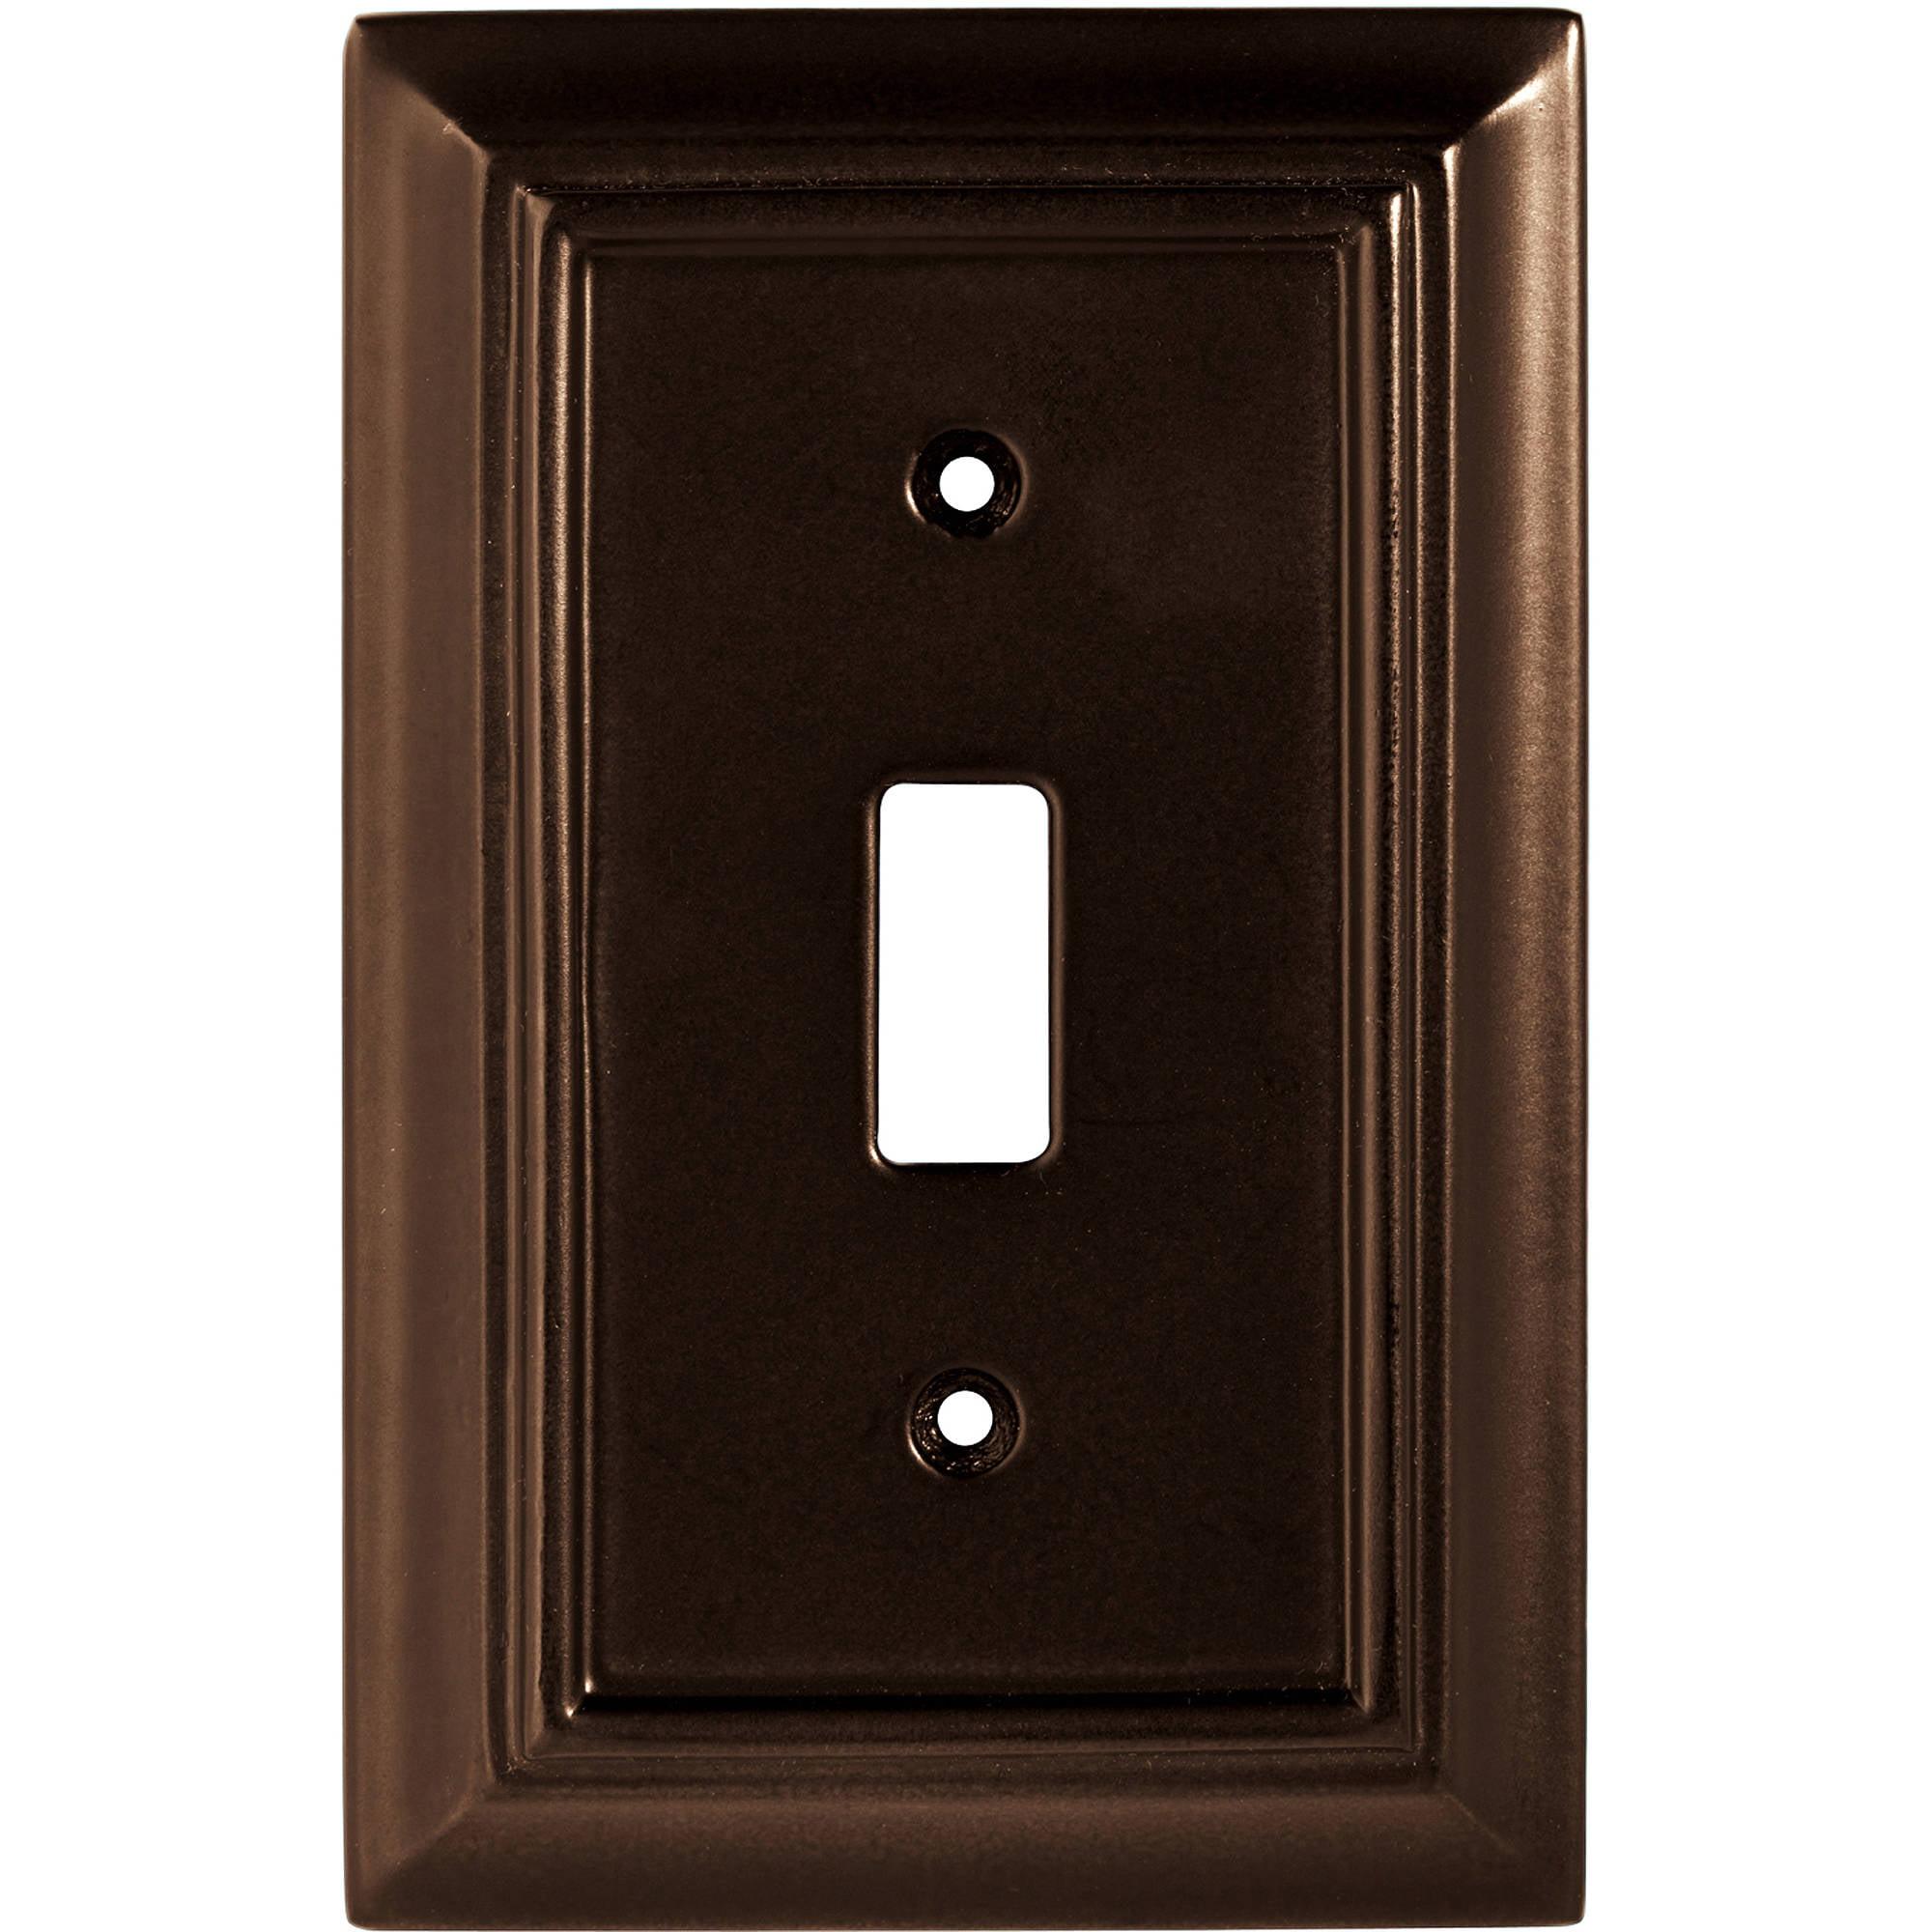 Brainerd Wood Architectural Single Switch Wall Plate, Espresso